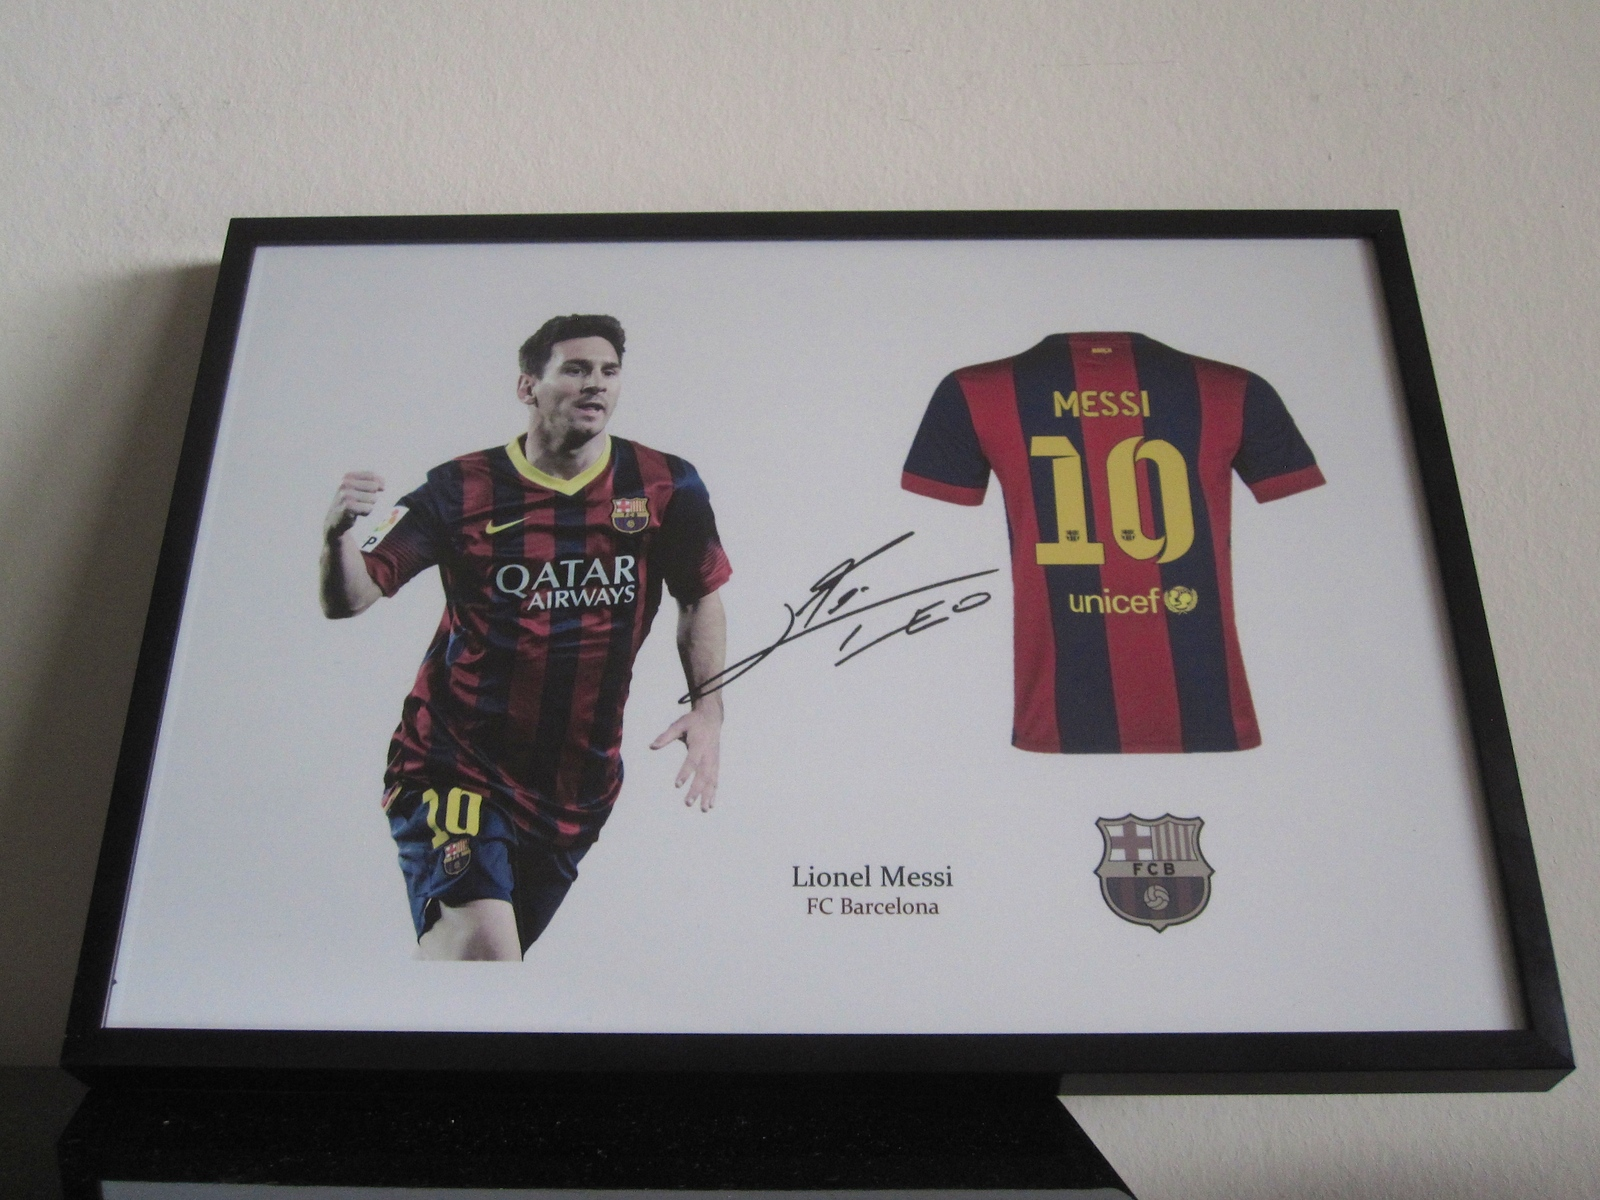 Lionel Messi FC Barcelona signed - Jersey - Soccer - FCB - RP autograph